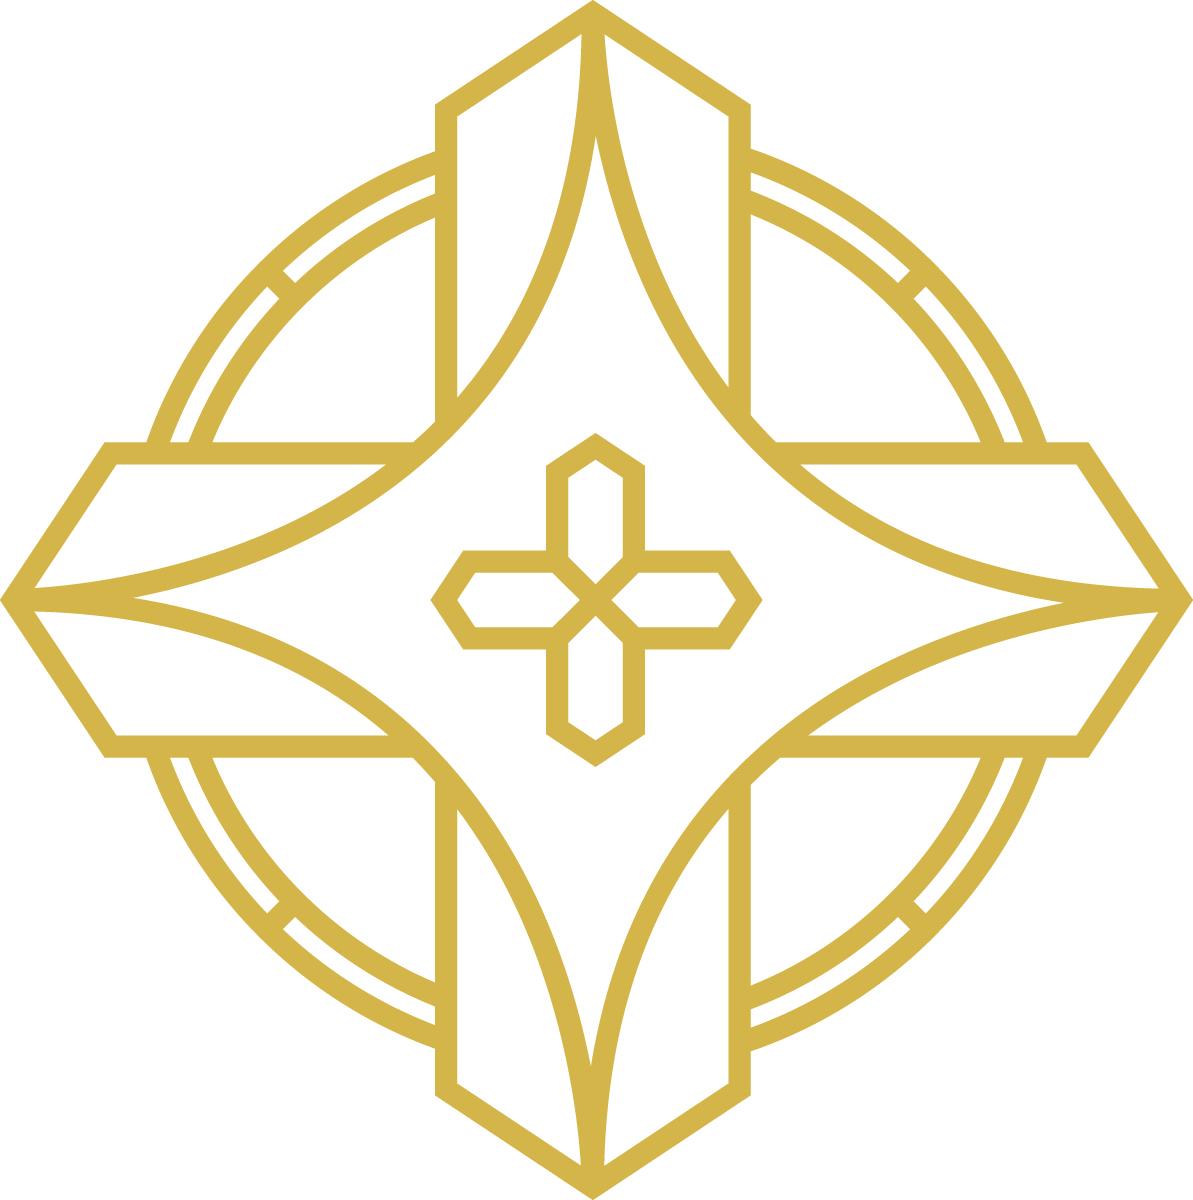 ppc_logo_2017_mark_gold_large.jpg